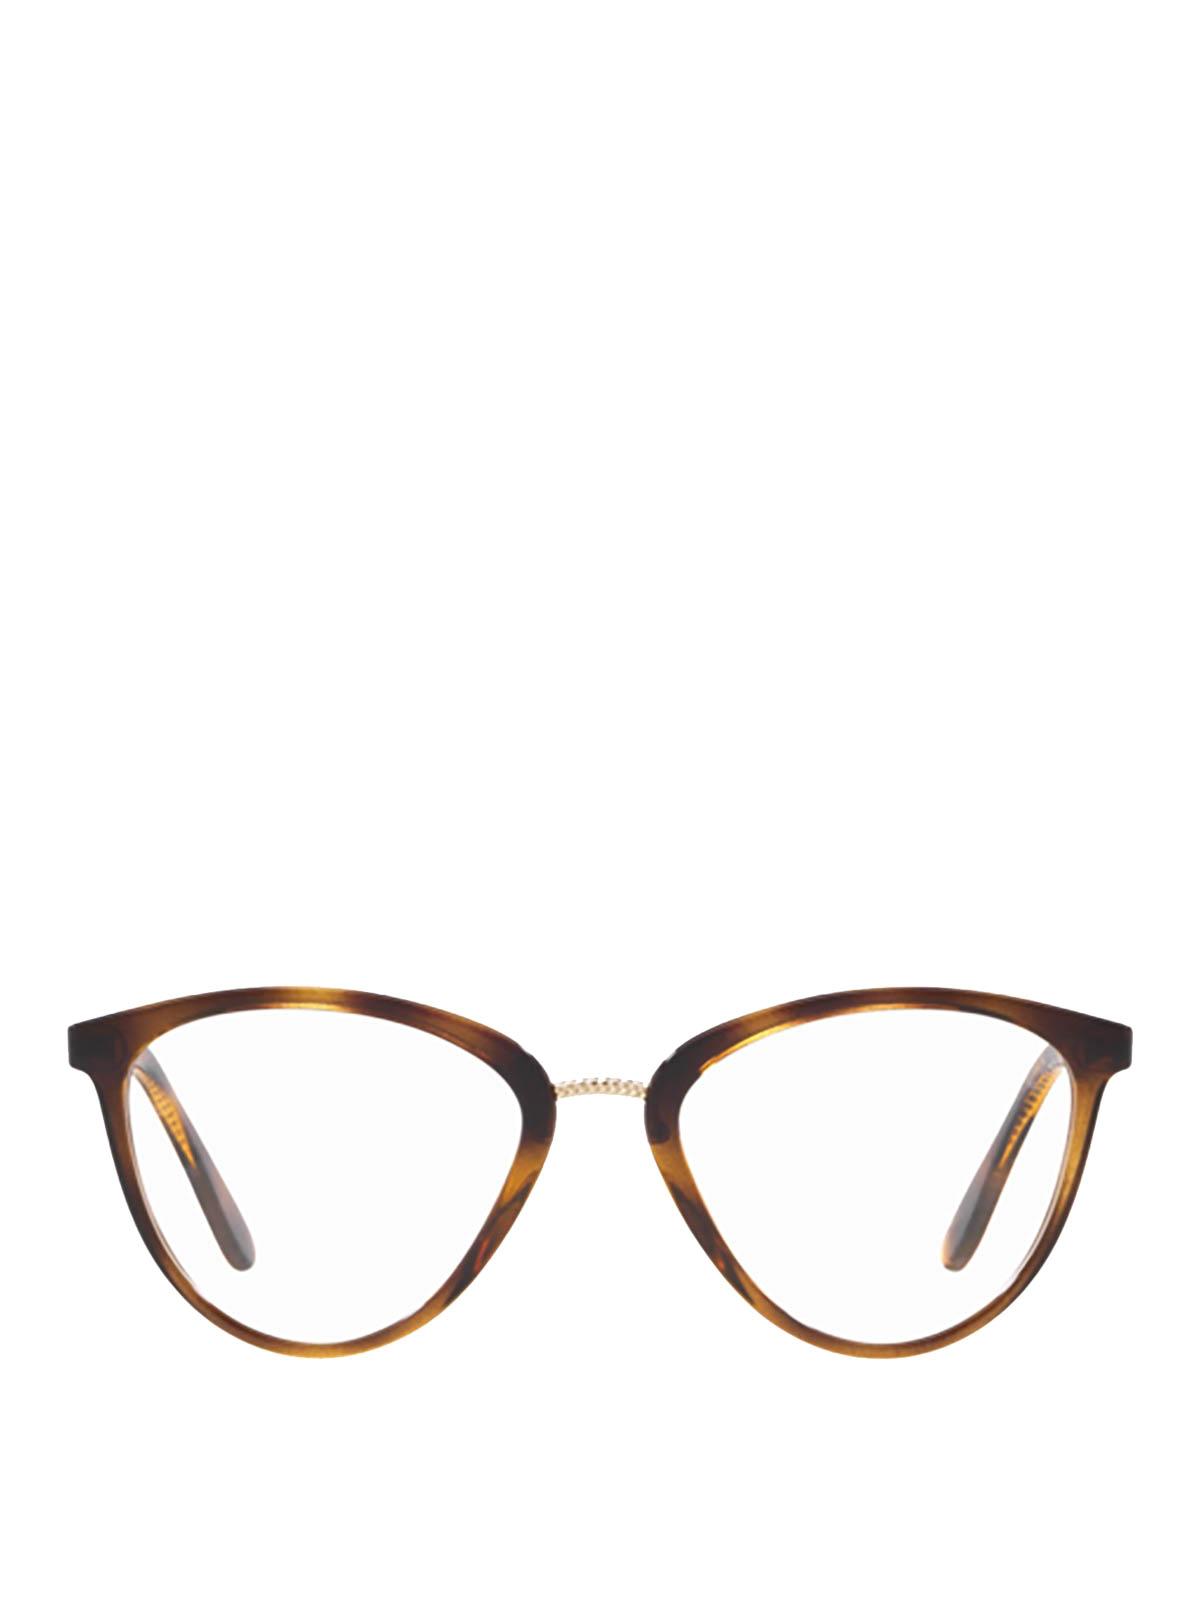 Vogue Metal Bridge Tortoise Eyeglasses عینک Vo5259w656 Ikrix